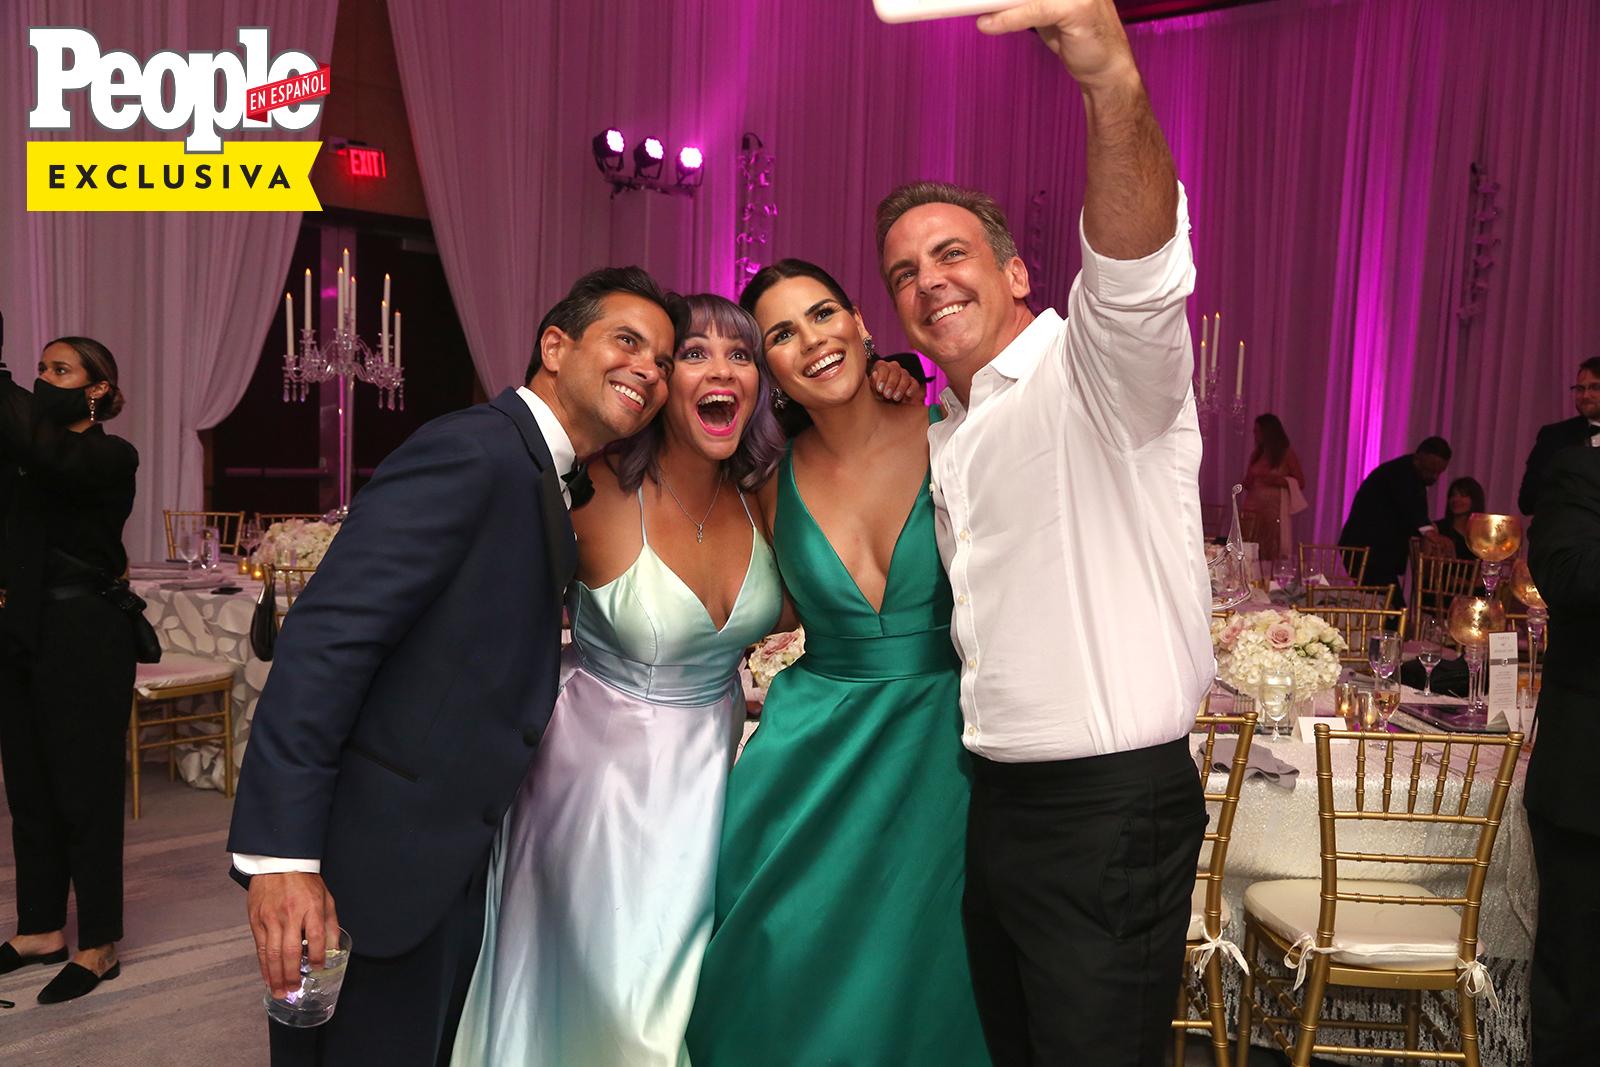 Boda Tanya Charry y Sebastian Jimenez